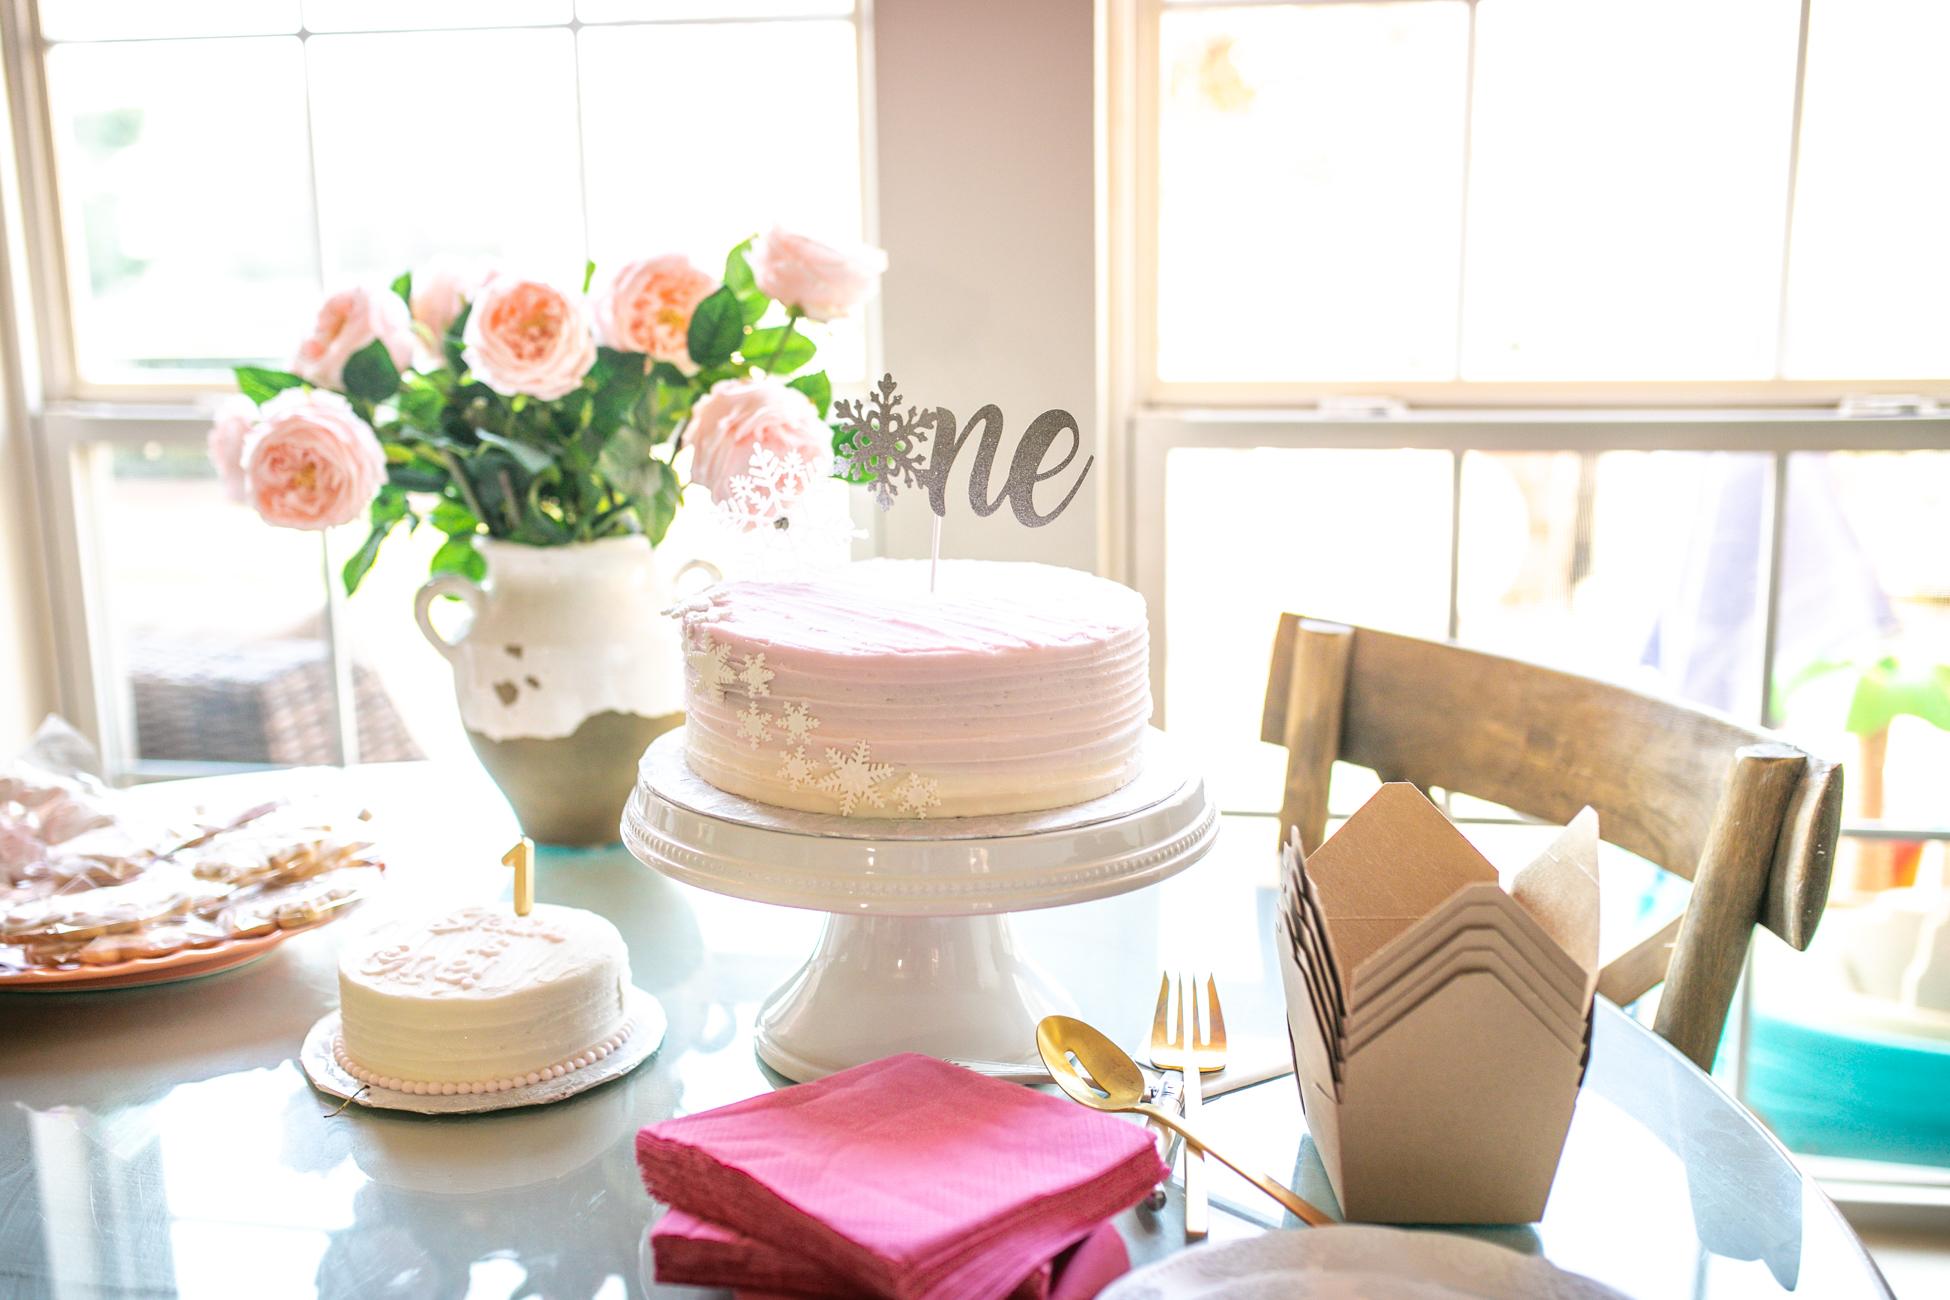 Simply Delicious Bakery Cake + Smash Cake